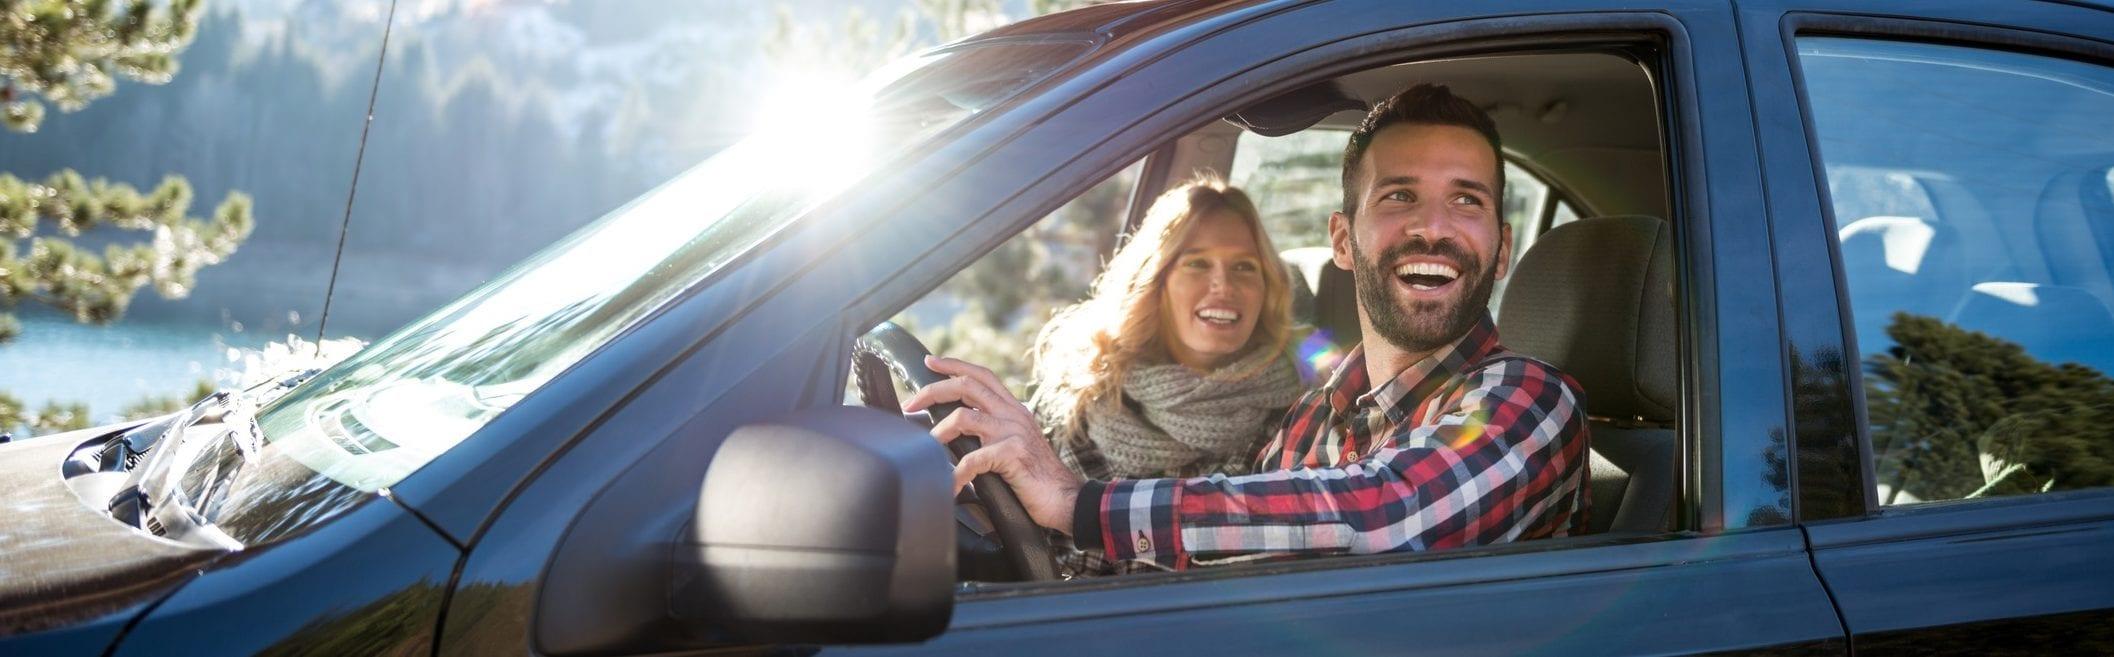 Truecar Car Buying Service Trumark Financial Credit Union